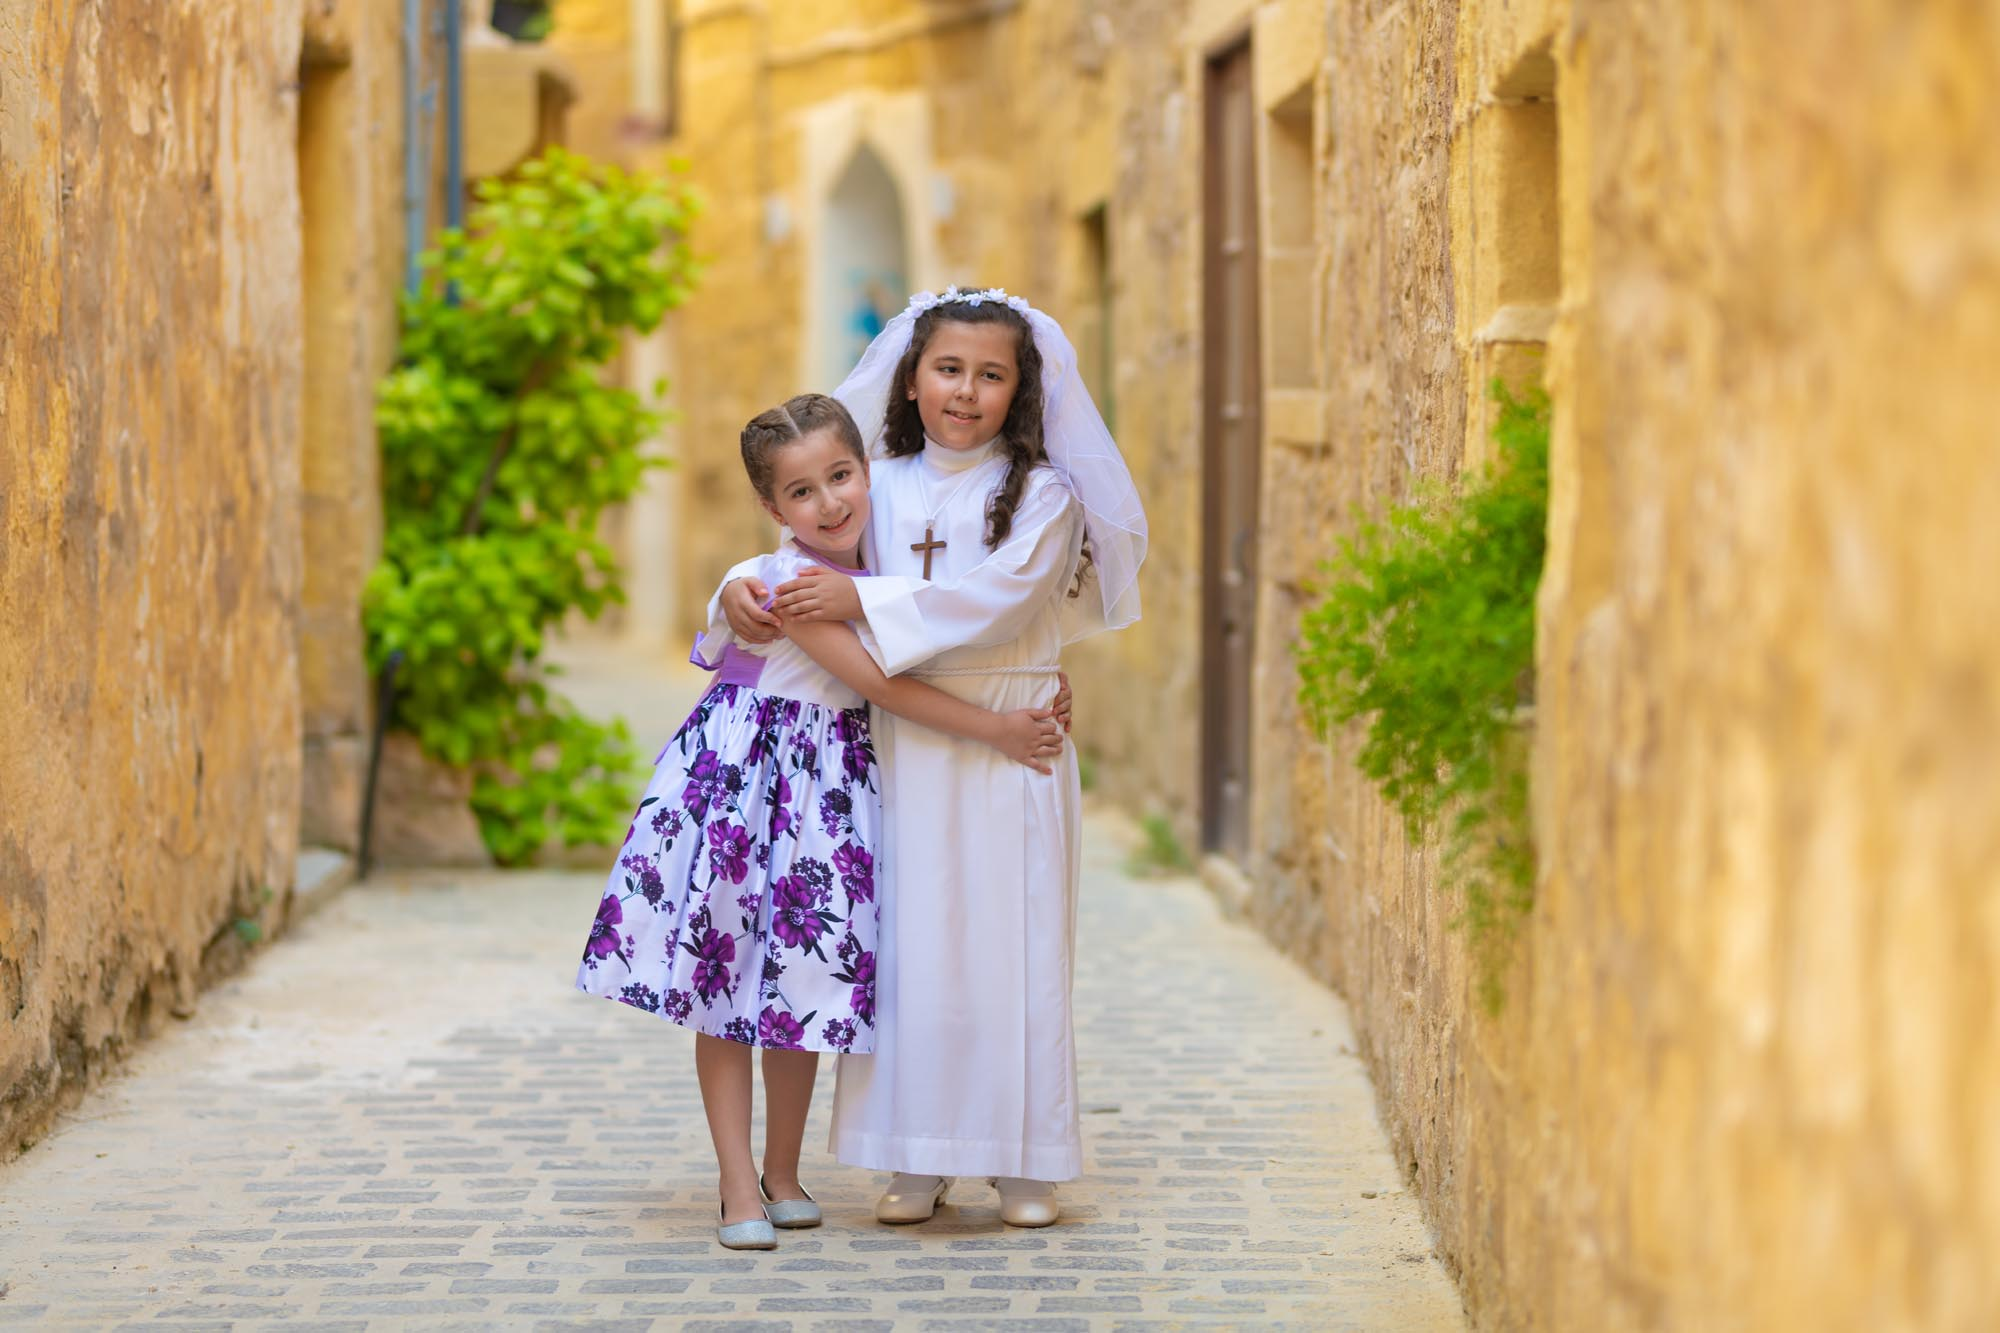 Communion Photoshoot in Mandragg, Gozo